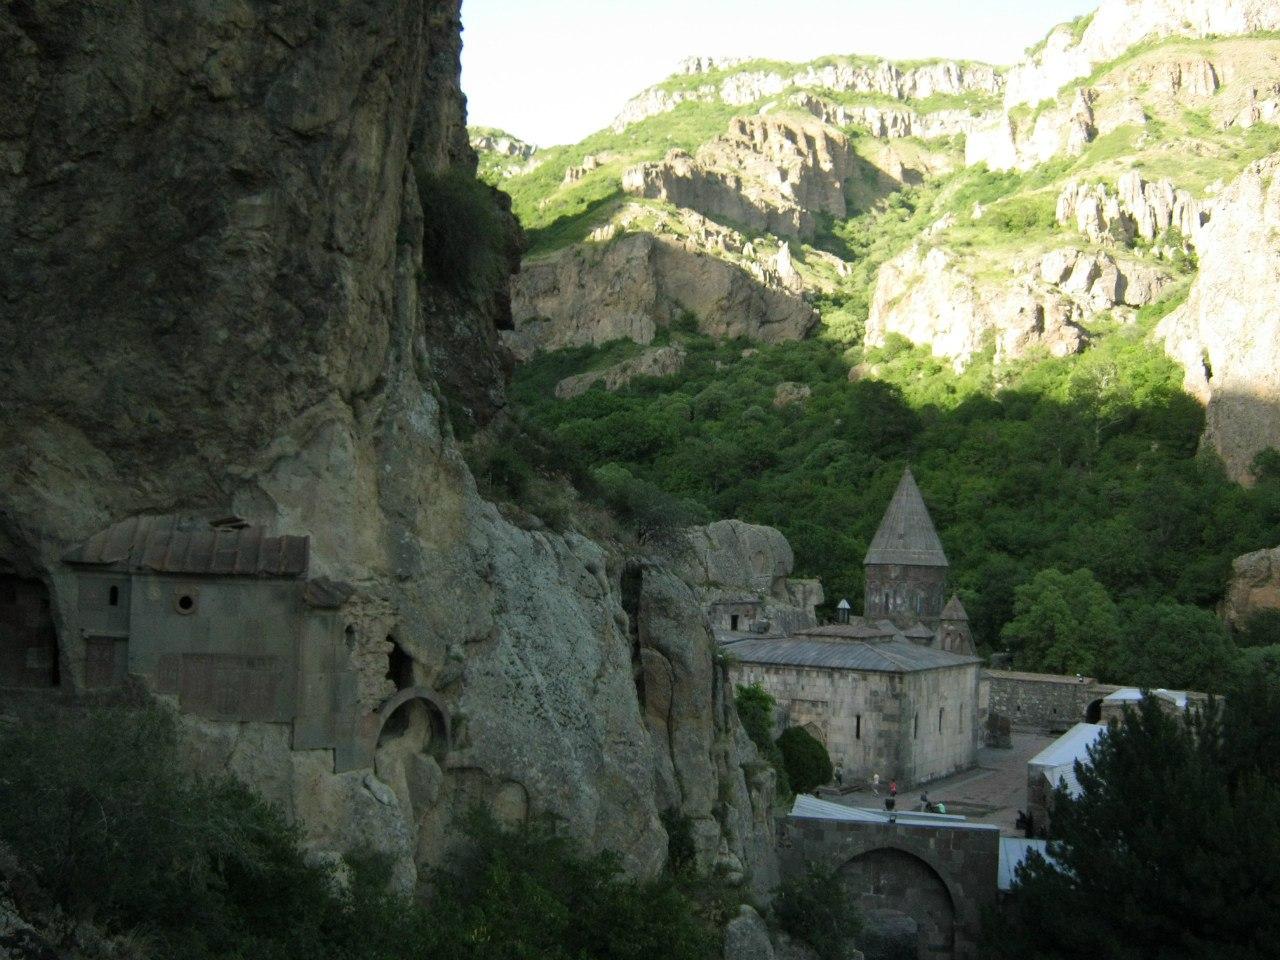 Монастырь Гегард, пещеры с хачкарами